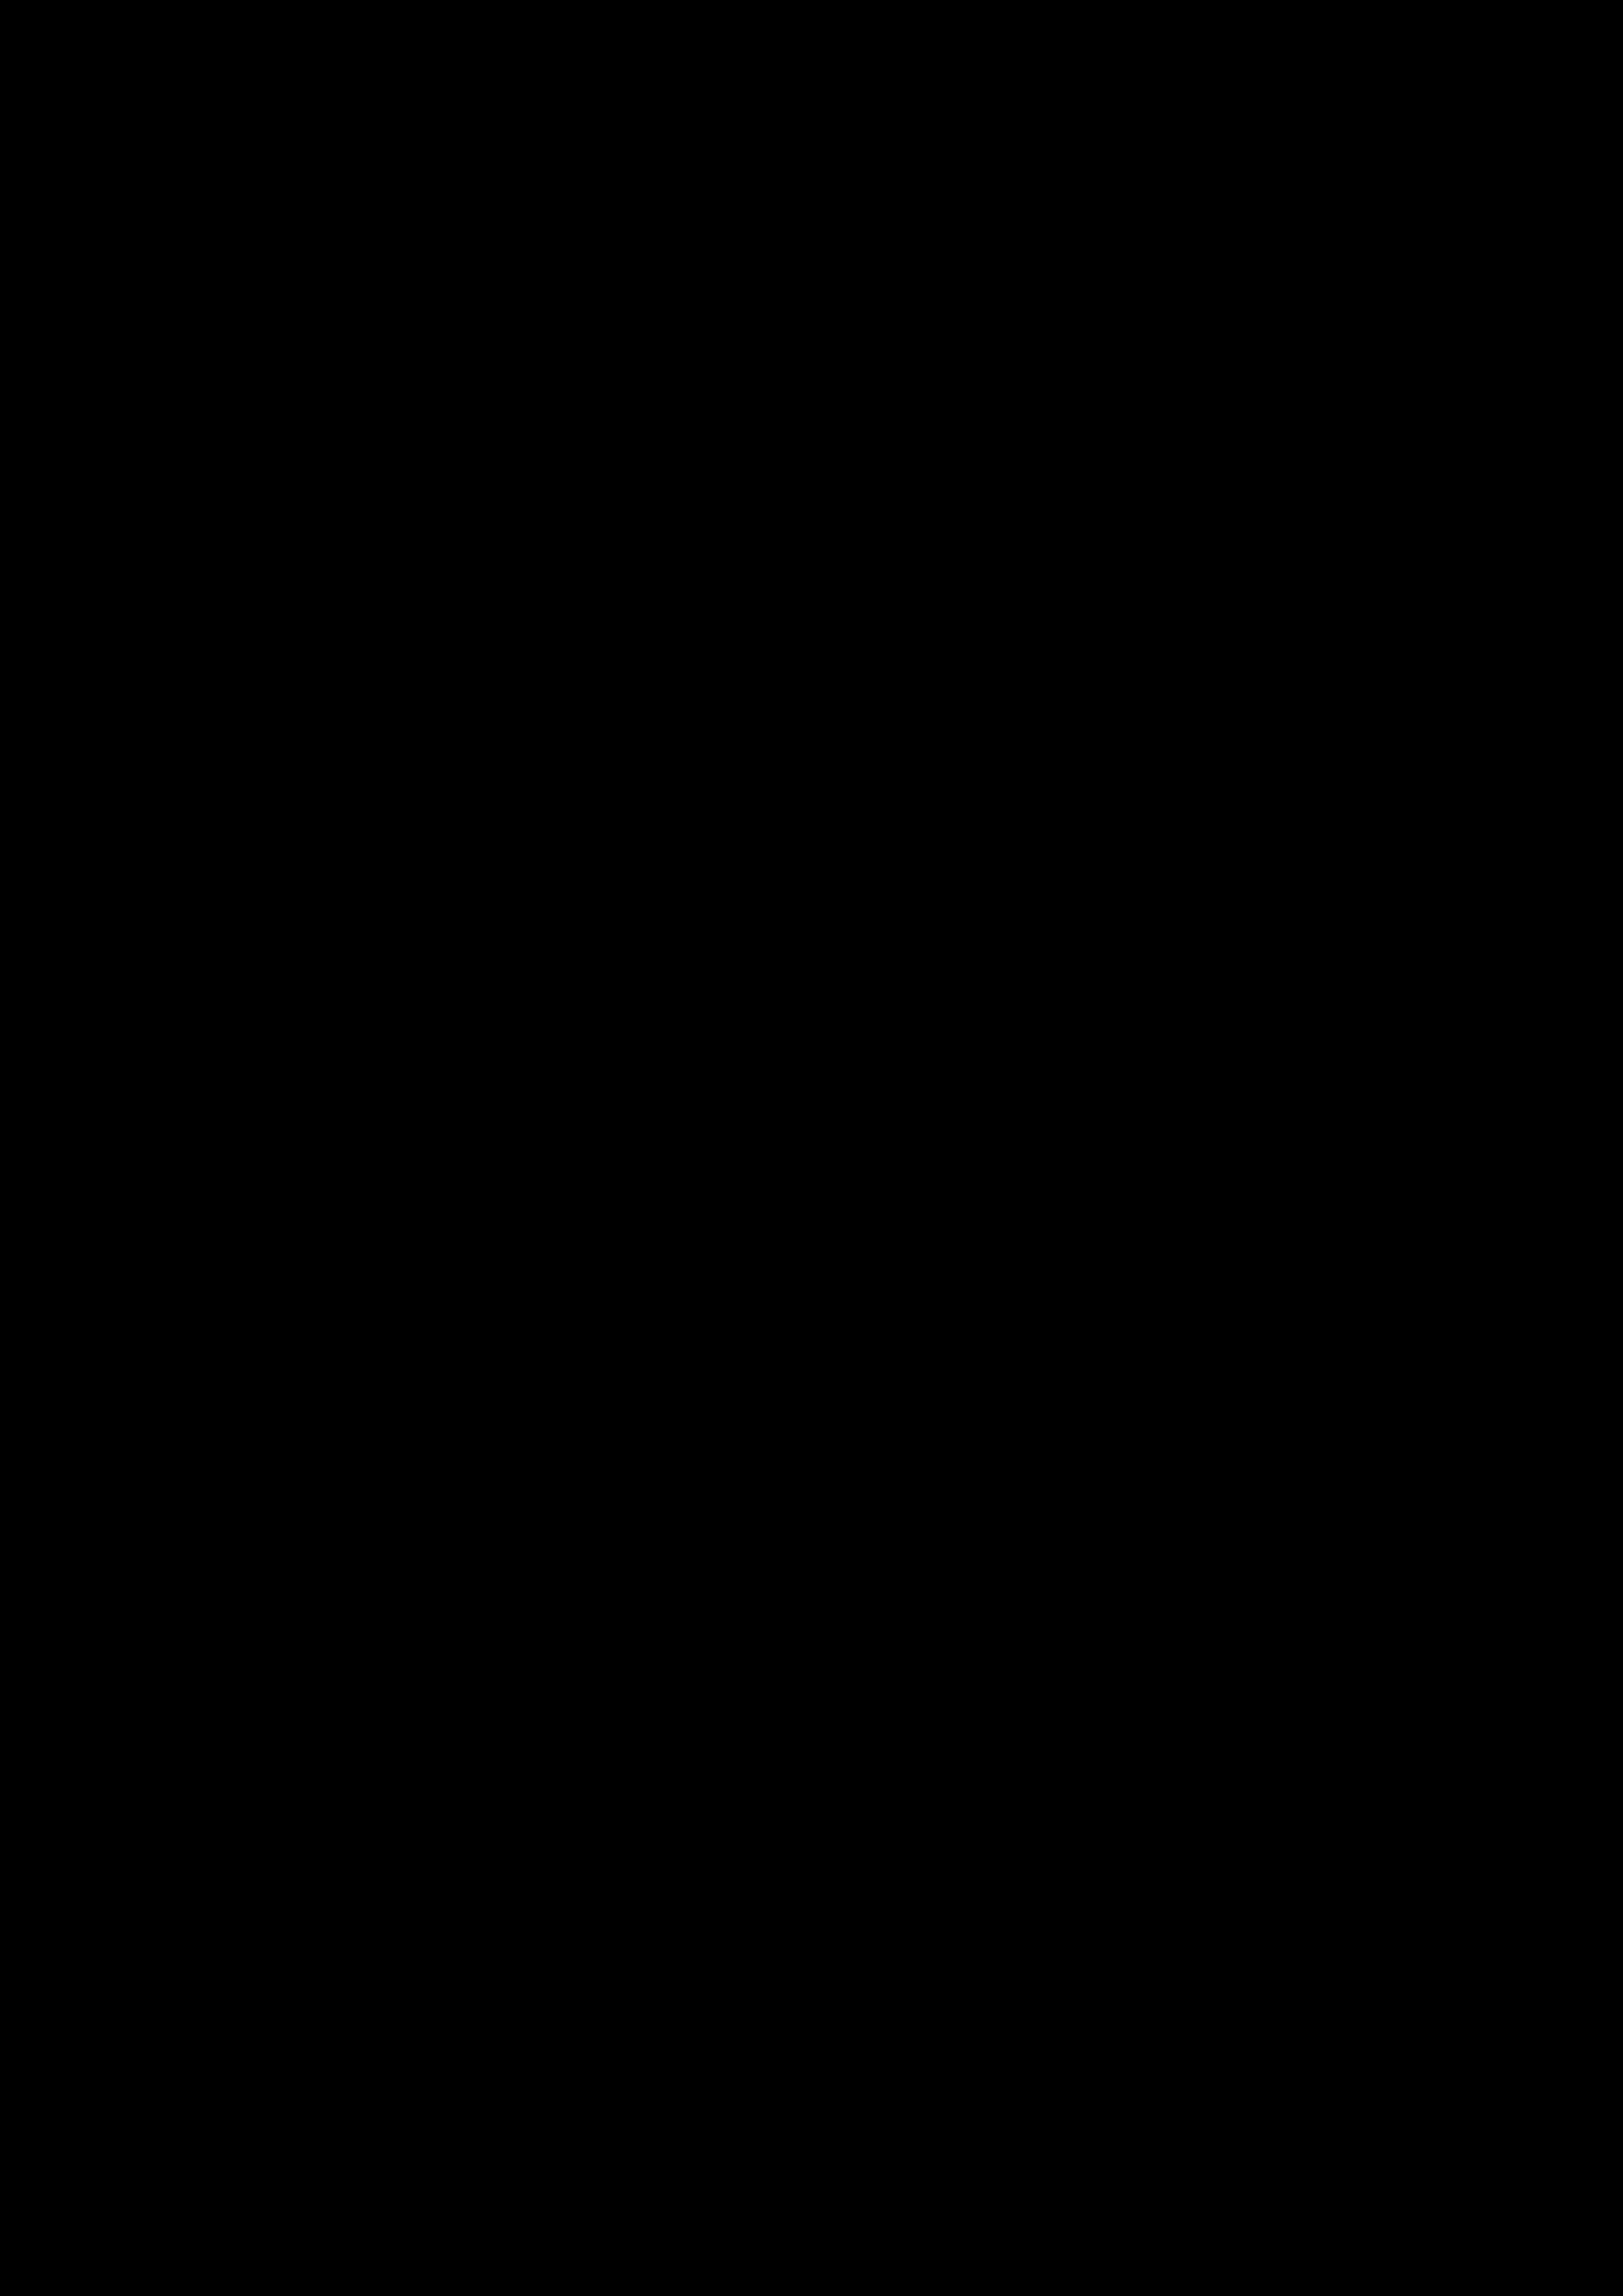 s19021214310_0001